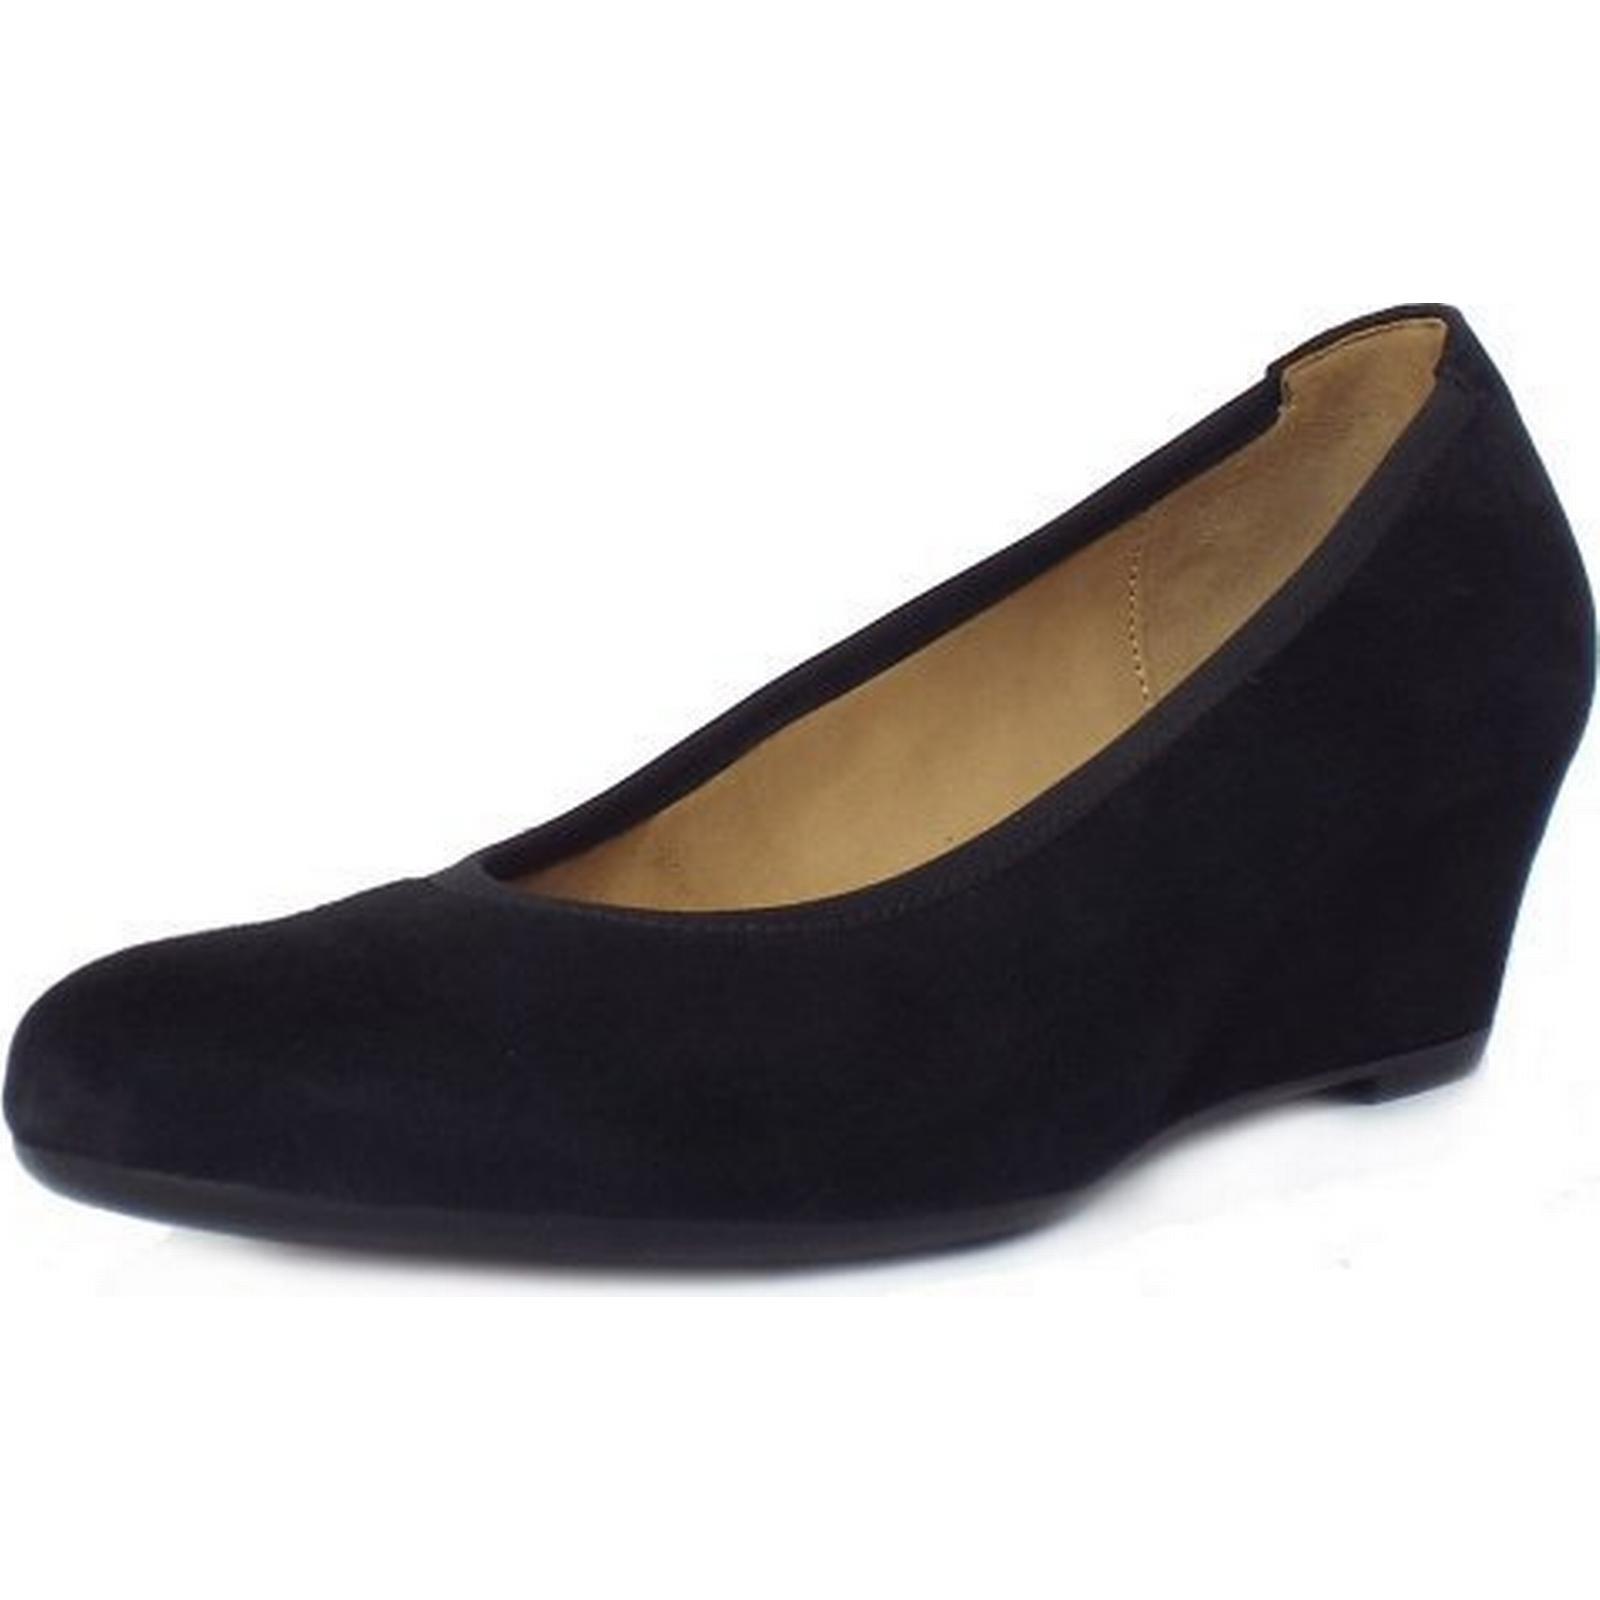 Gabor FANTASY GABOR LADIES LADIES GABOR SHOES 45 360 17 Size: 5.5, Colour: BLACK SU 77d202